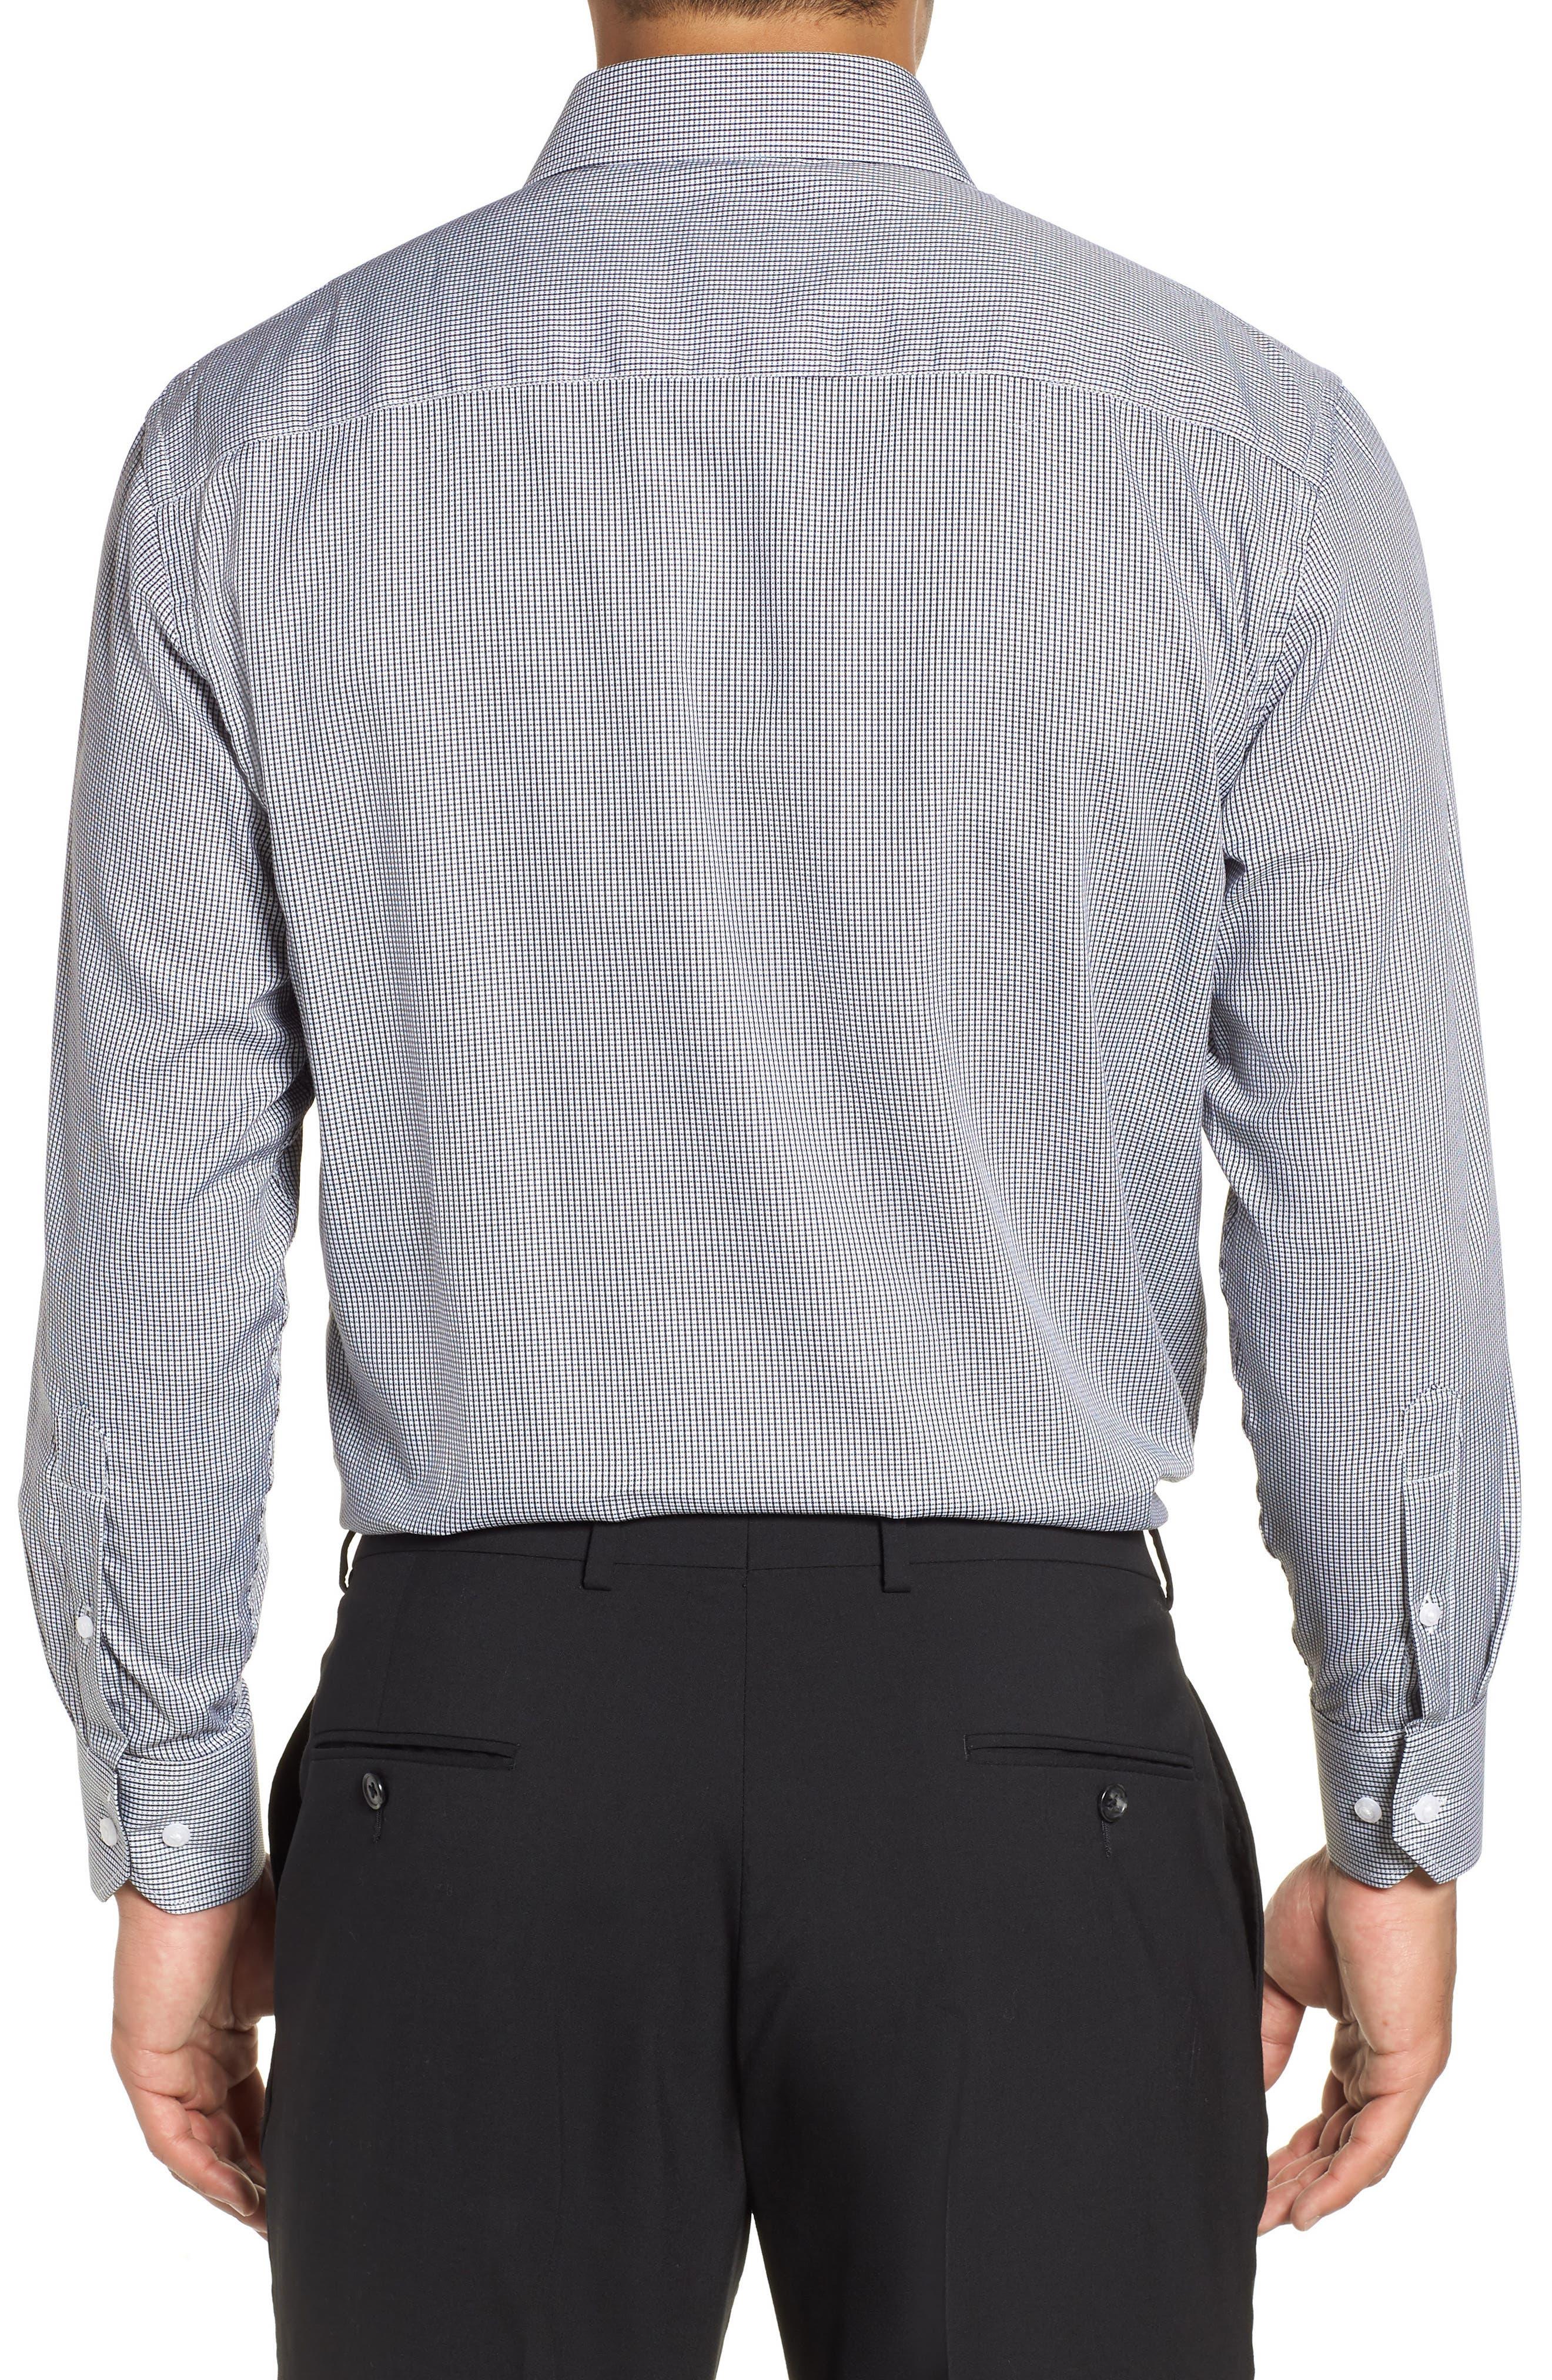 ENGLISH LAUNDRY,                             Regular Fit Check Dress Shirt,                             Alternate thumbnail 3, color,                             001